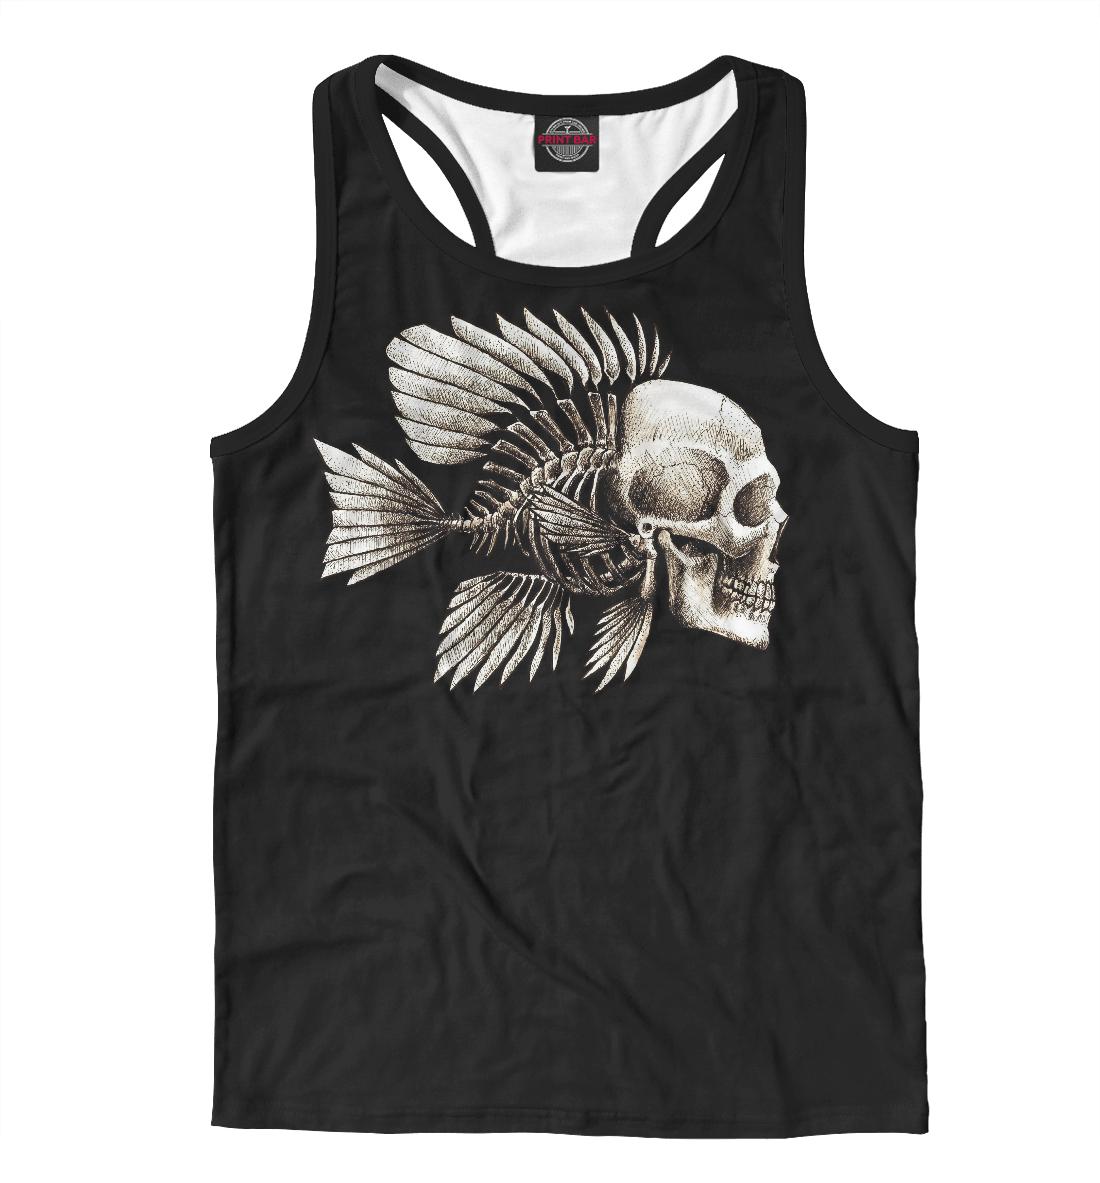 Купить Skull Fish, Printbar, Майки борцовки, SKU-392372-mayb-2